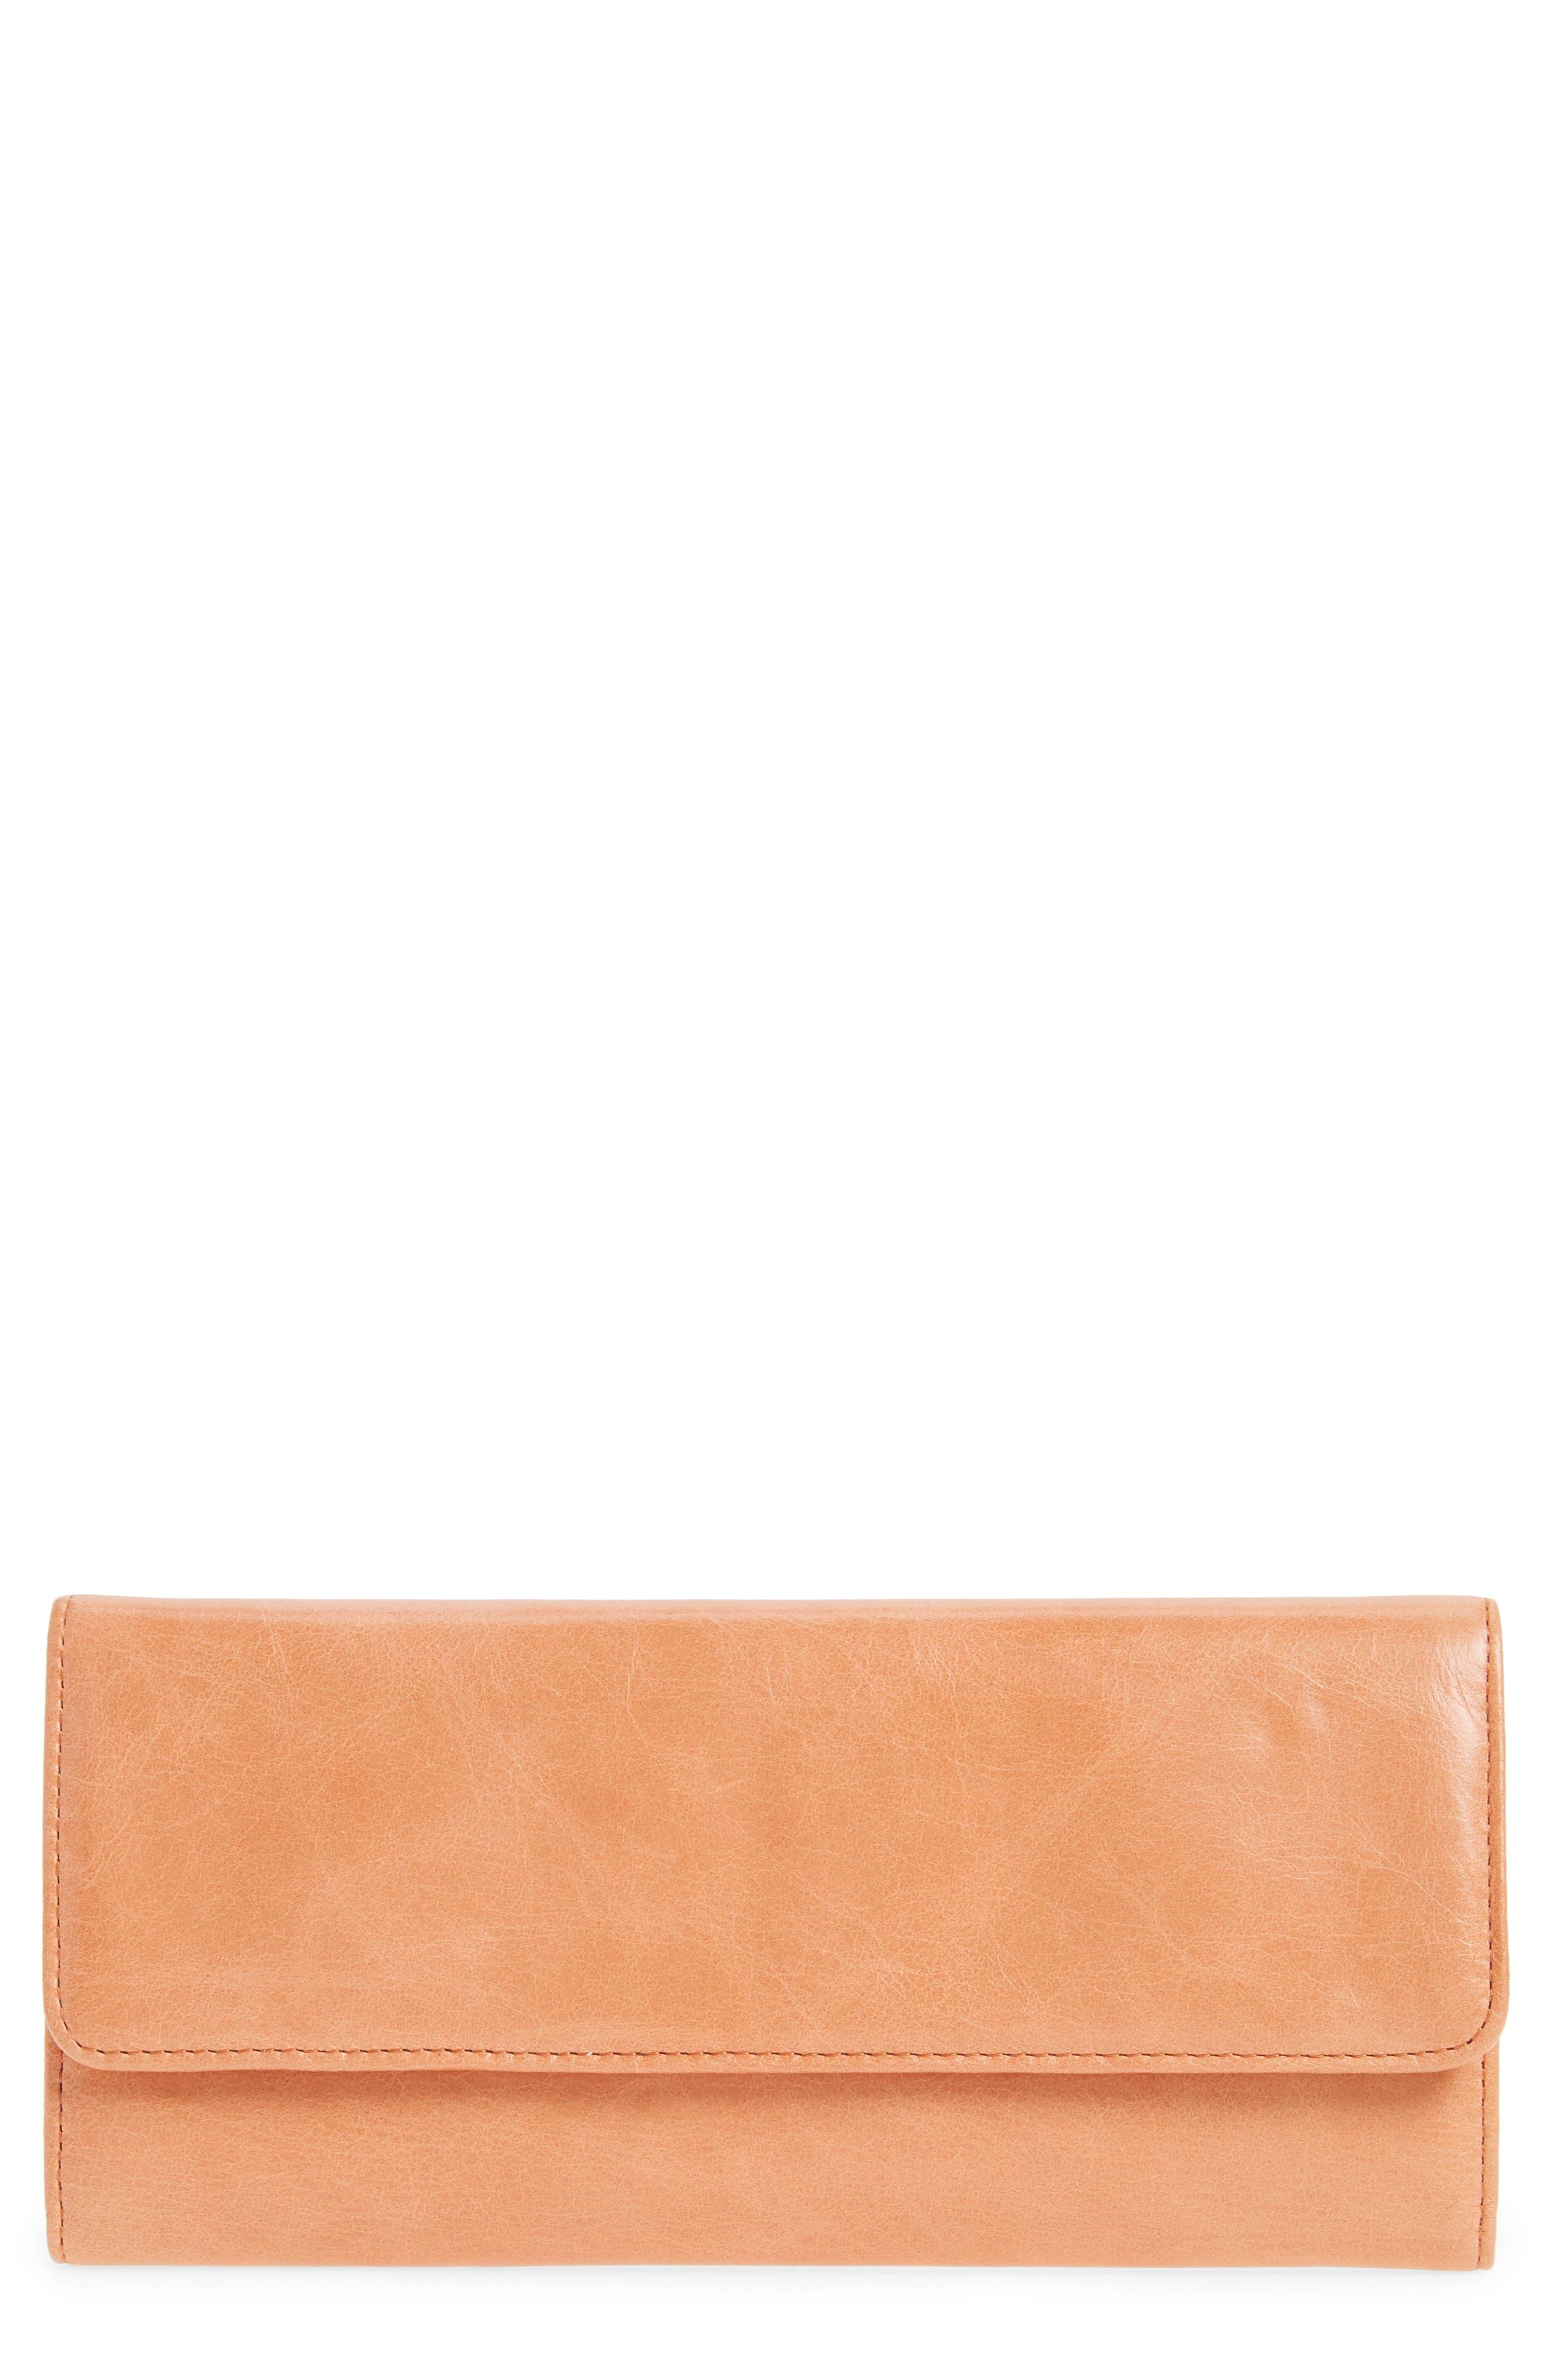 'Sadie' Leather Wallet,                             Main thumbnail 12, color,